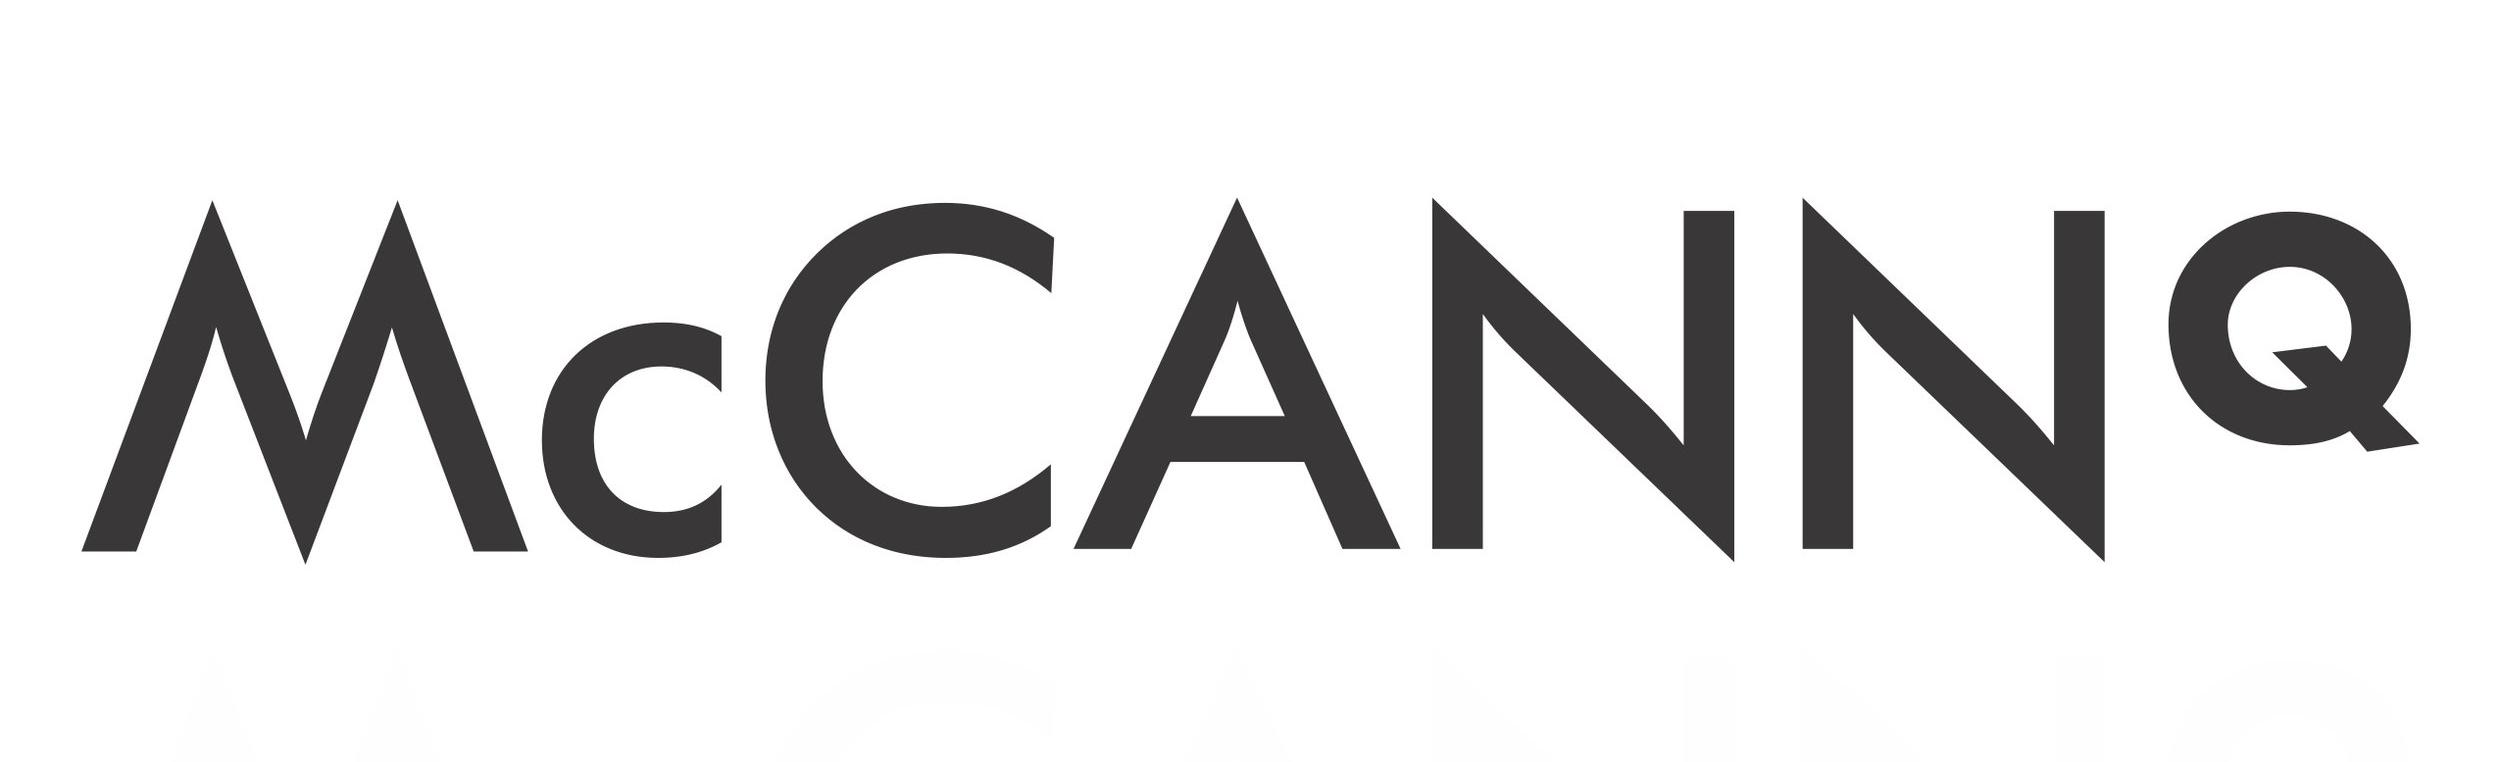 McCannQ_Logo_WhiteBlack_2016[12].jpg